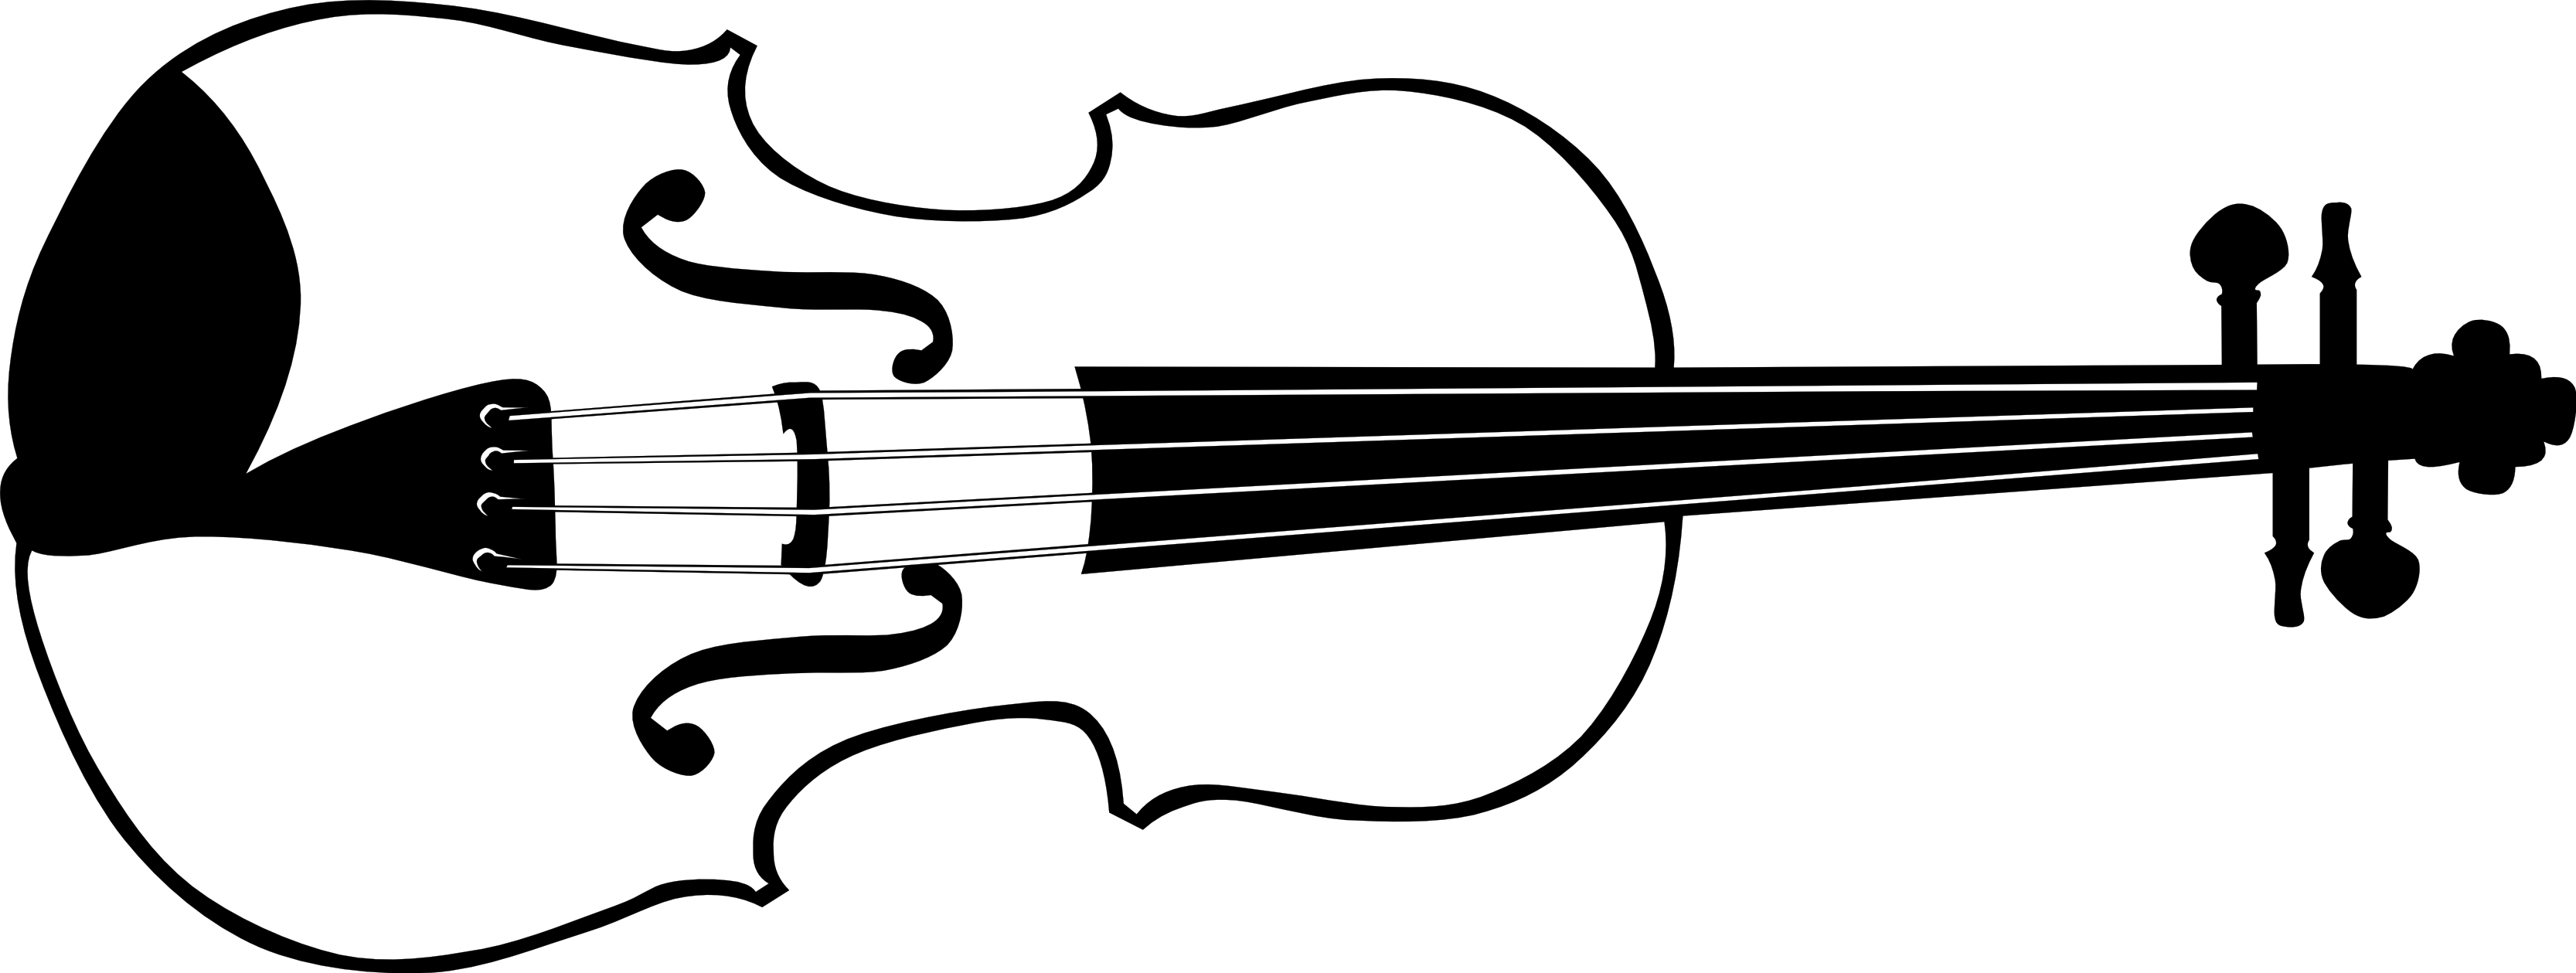 Violin images clip art. Piano clipart musique